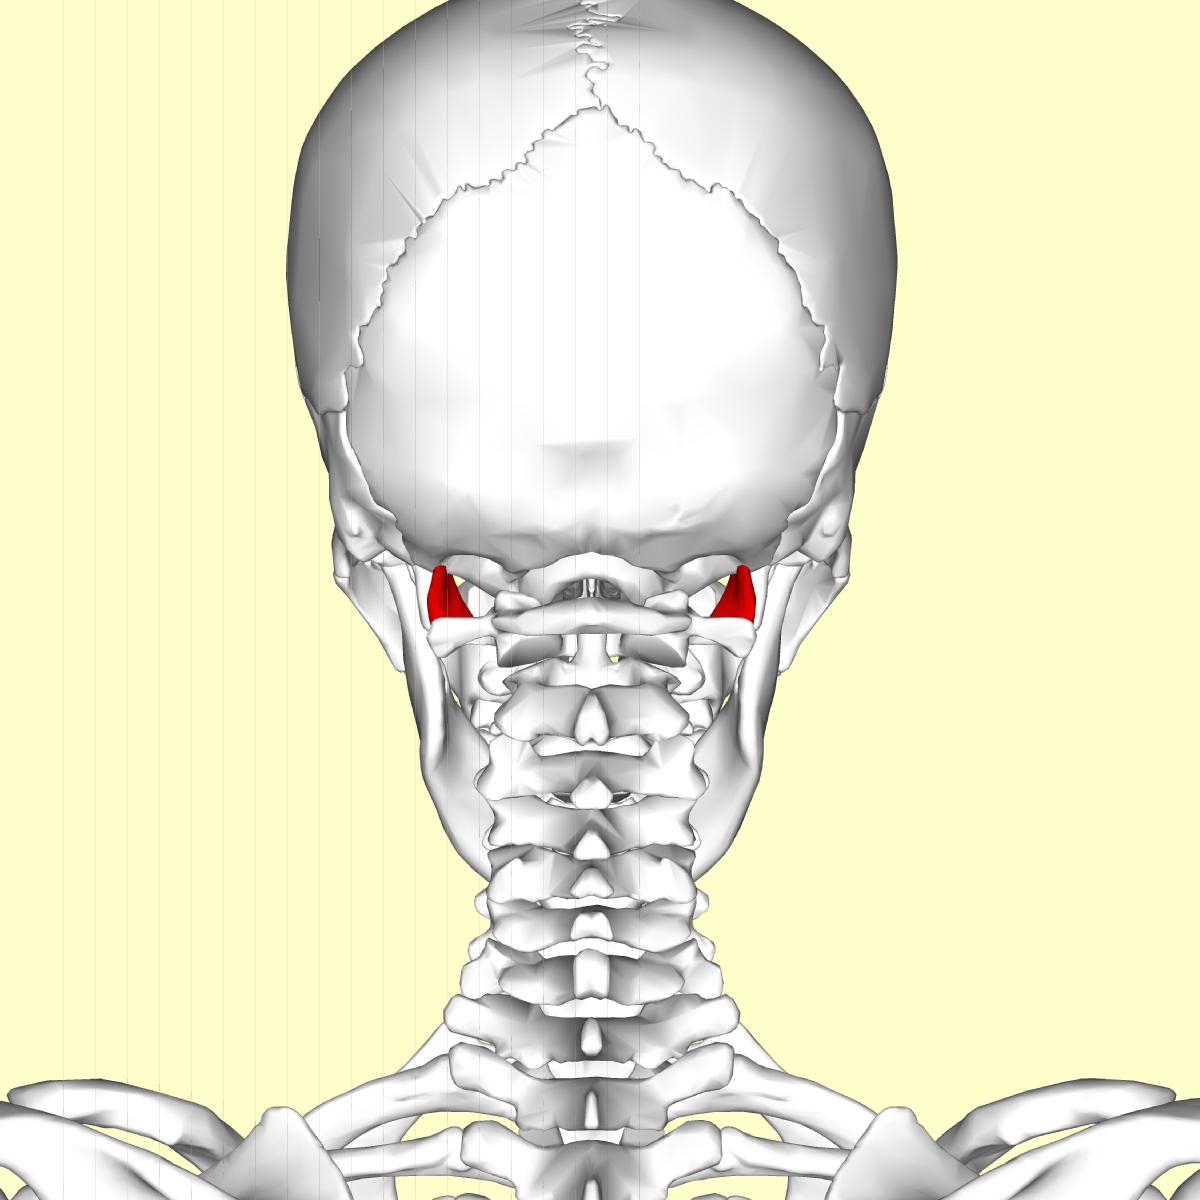 Rectus capitis lateralis muscle - Wikipedia